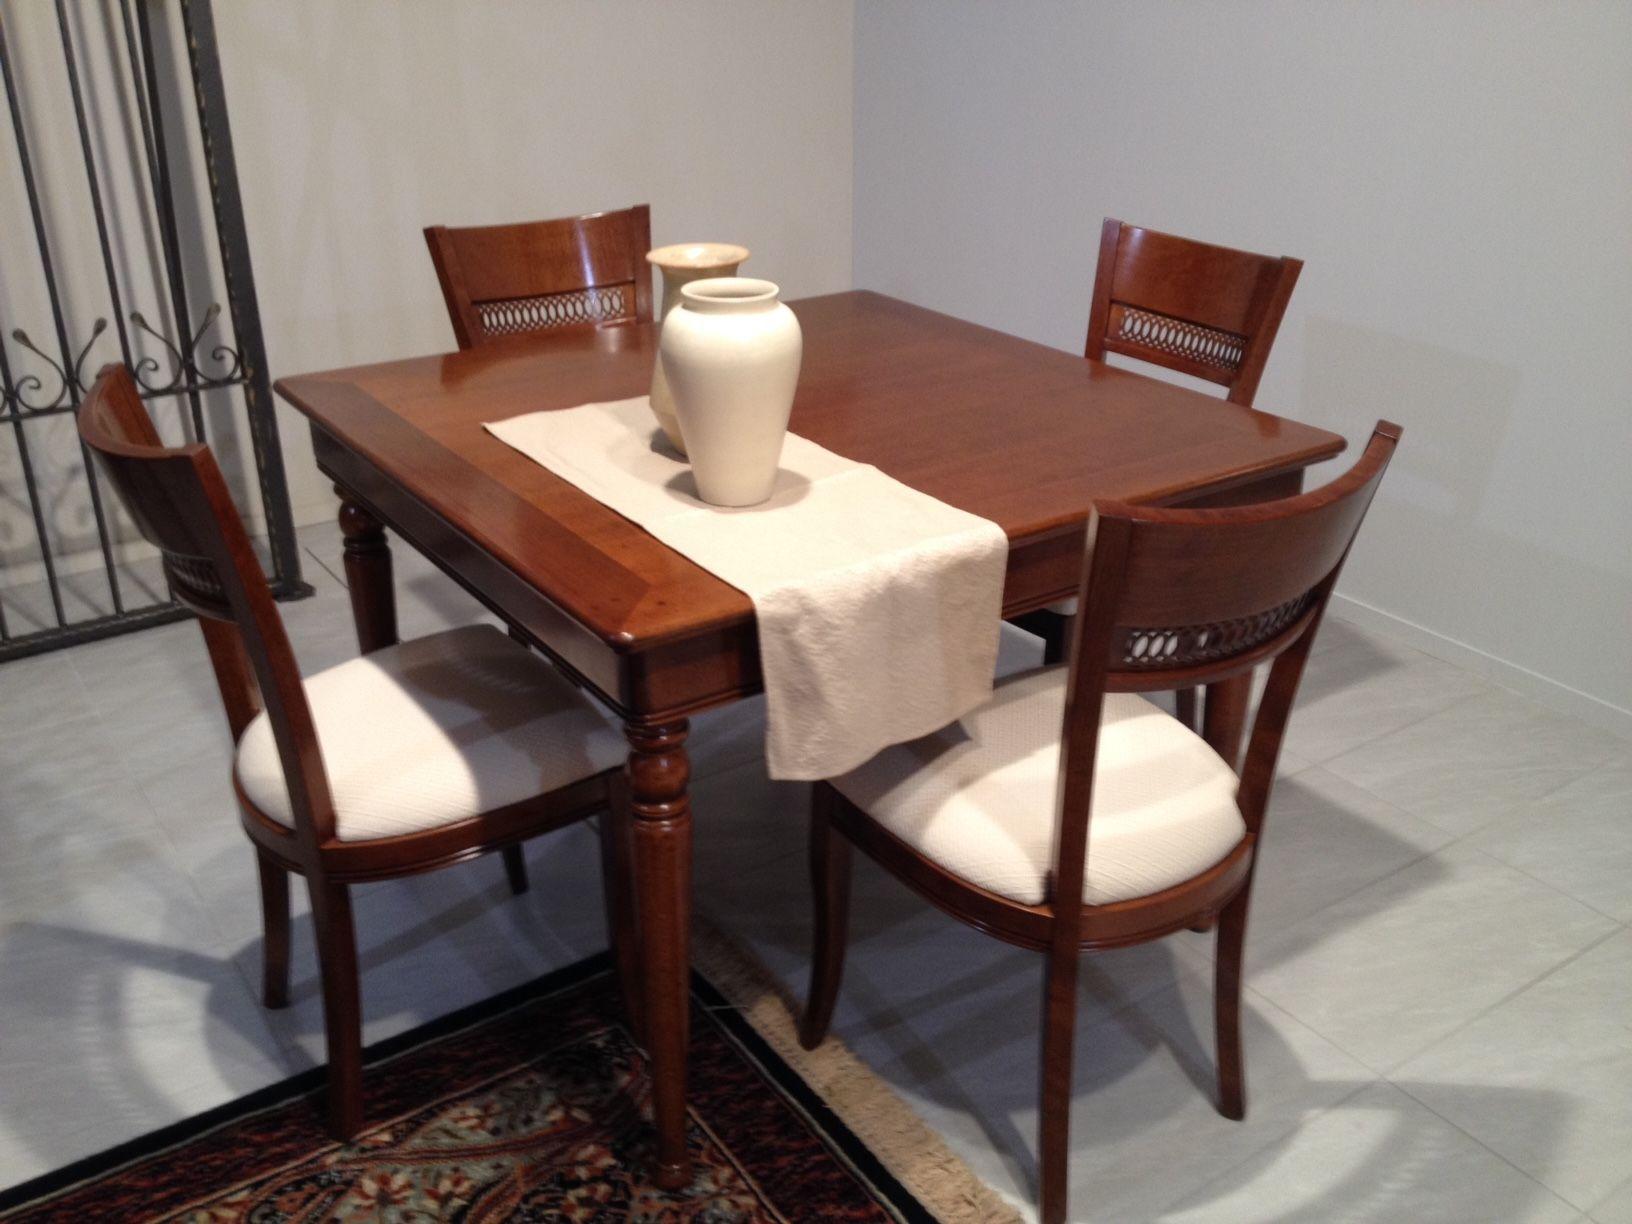 Tavolo e 4 sedie Le Fablier modello Le Gemme | < casa >